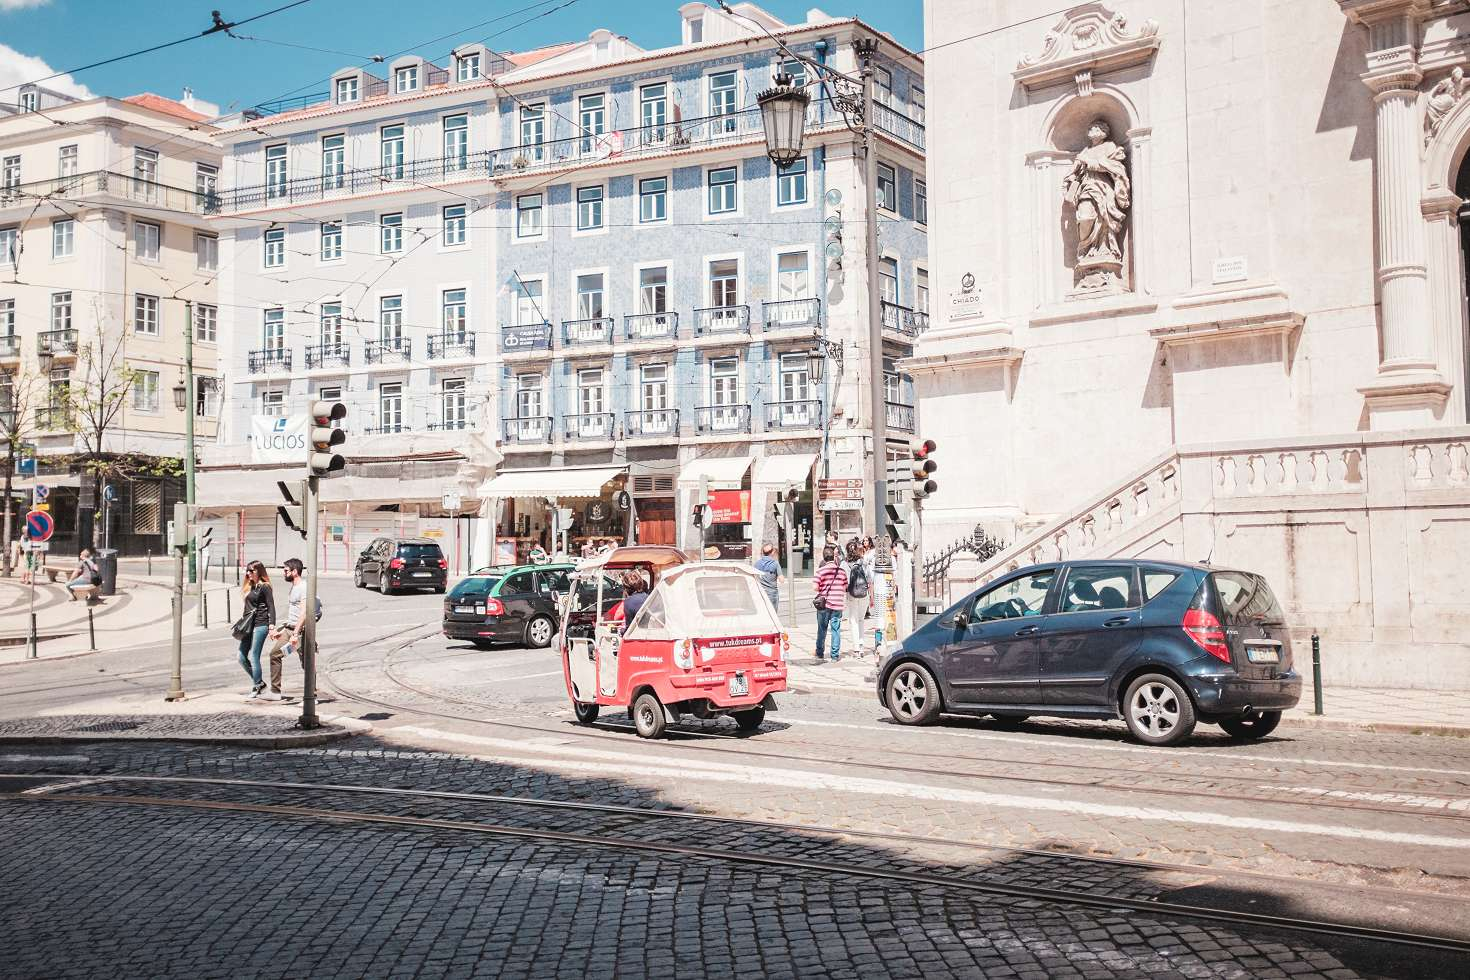 Valencia-Lissabon-Vigo-Stonehenge (26)